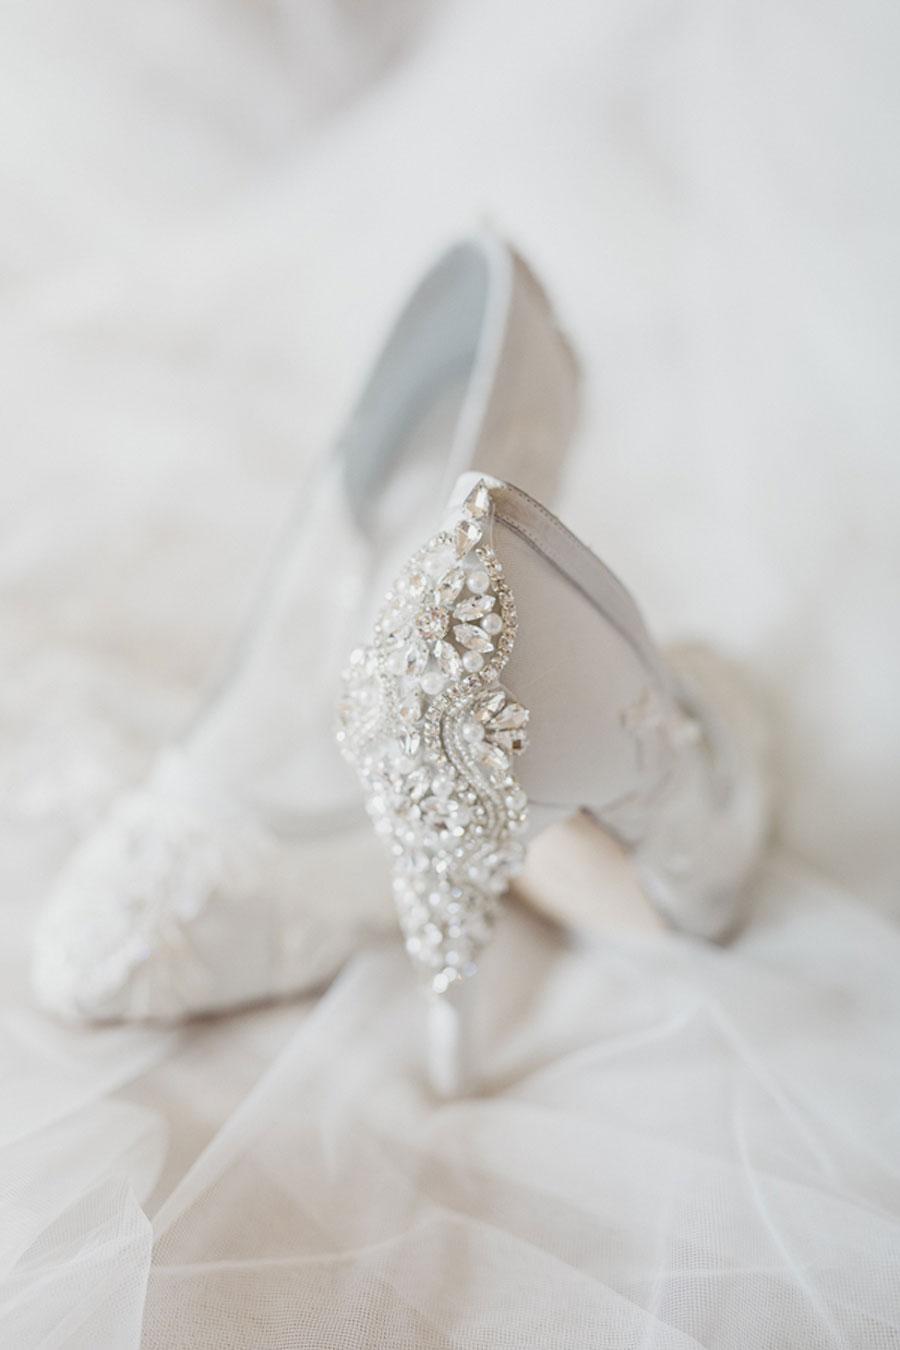 Wedding-Nicholad-and-Federica-Giuseppe-Giovannelli-301